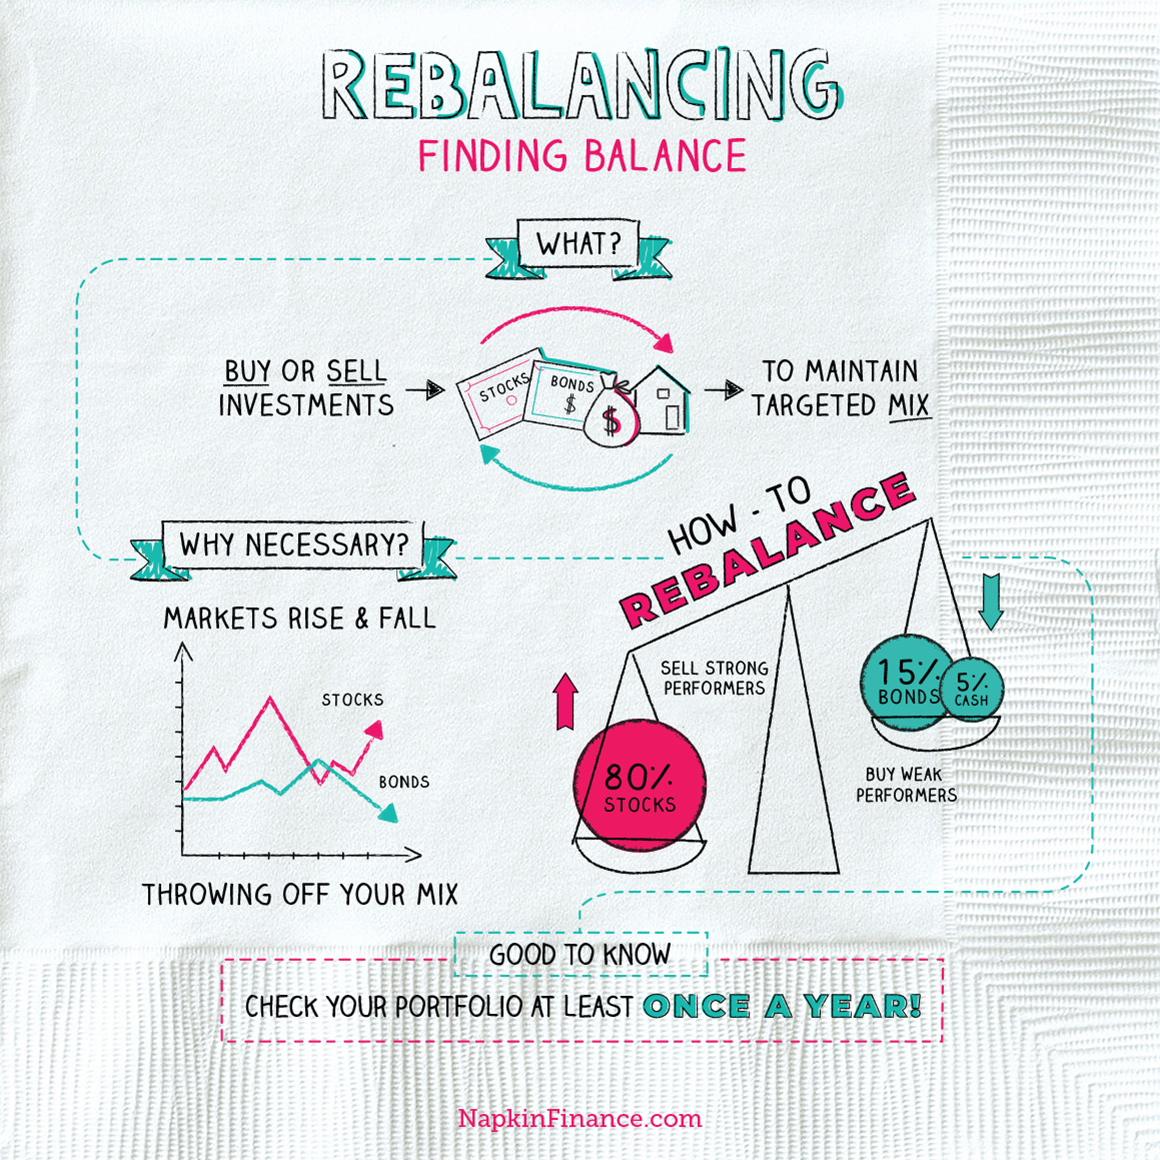 Rebalancing NapkinFinance